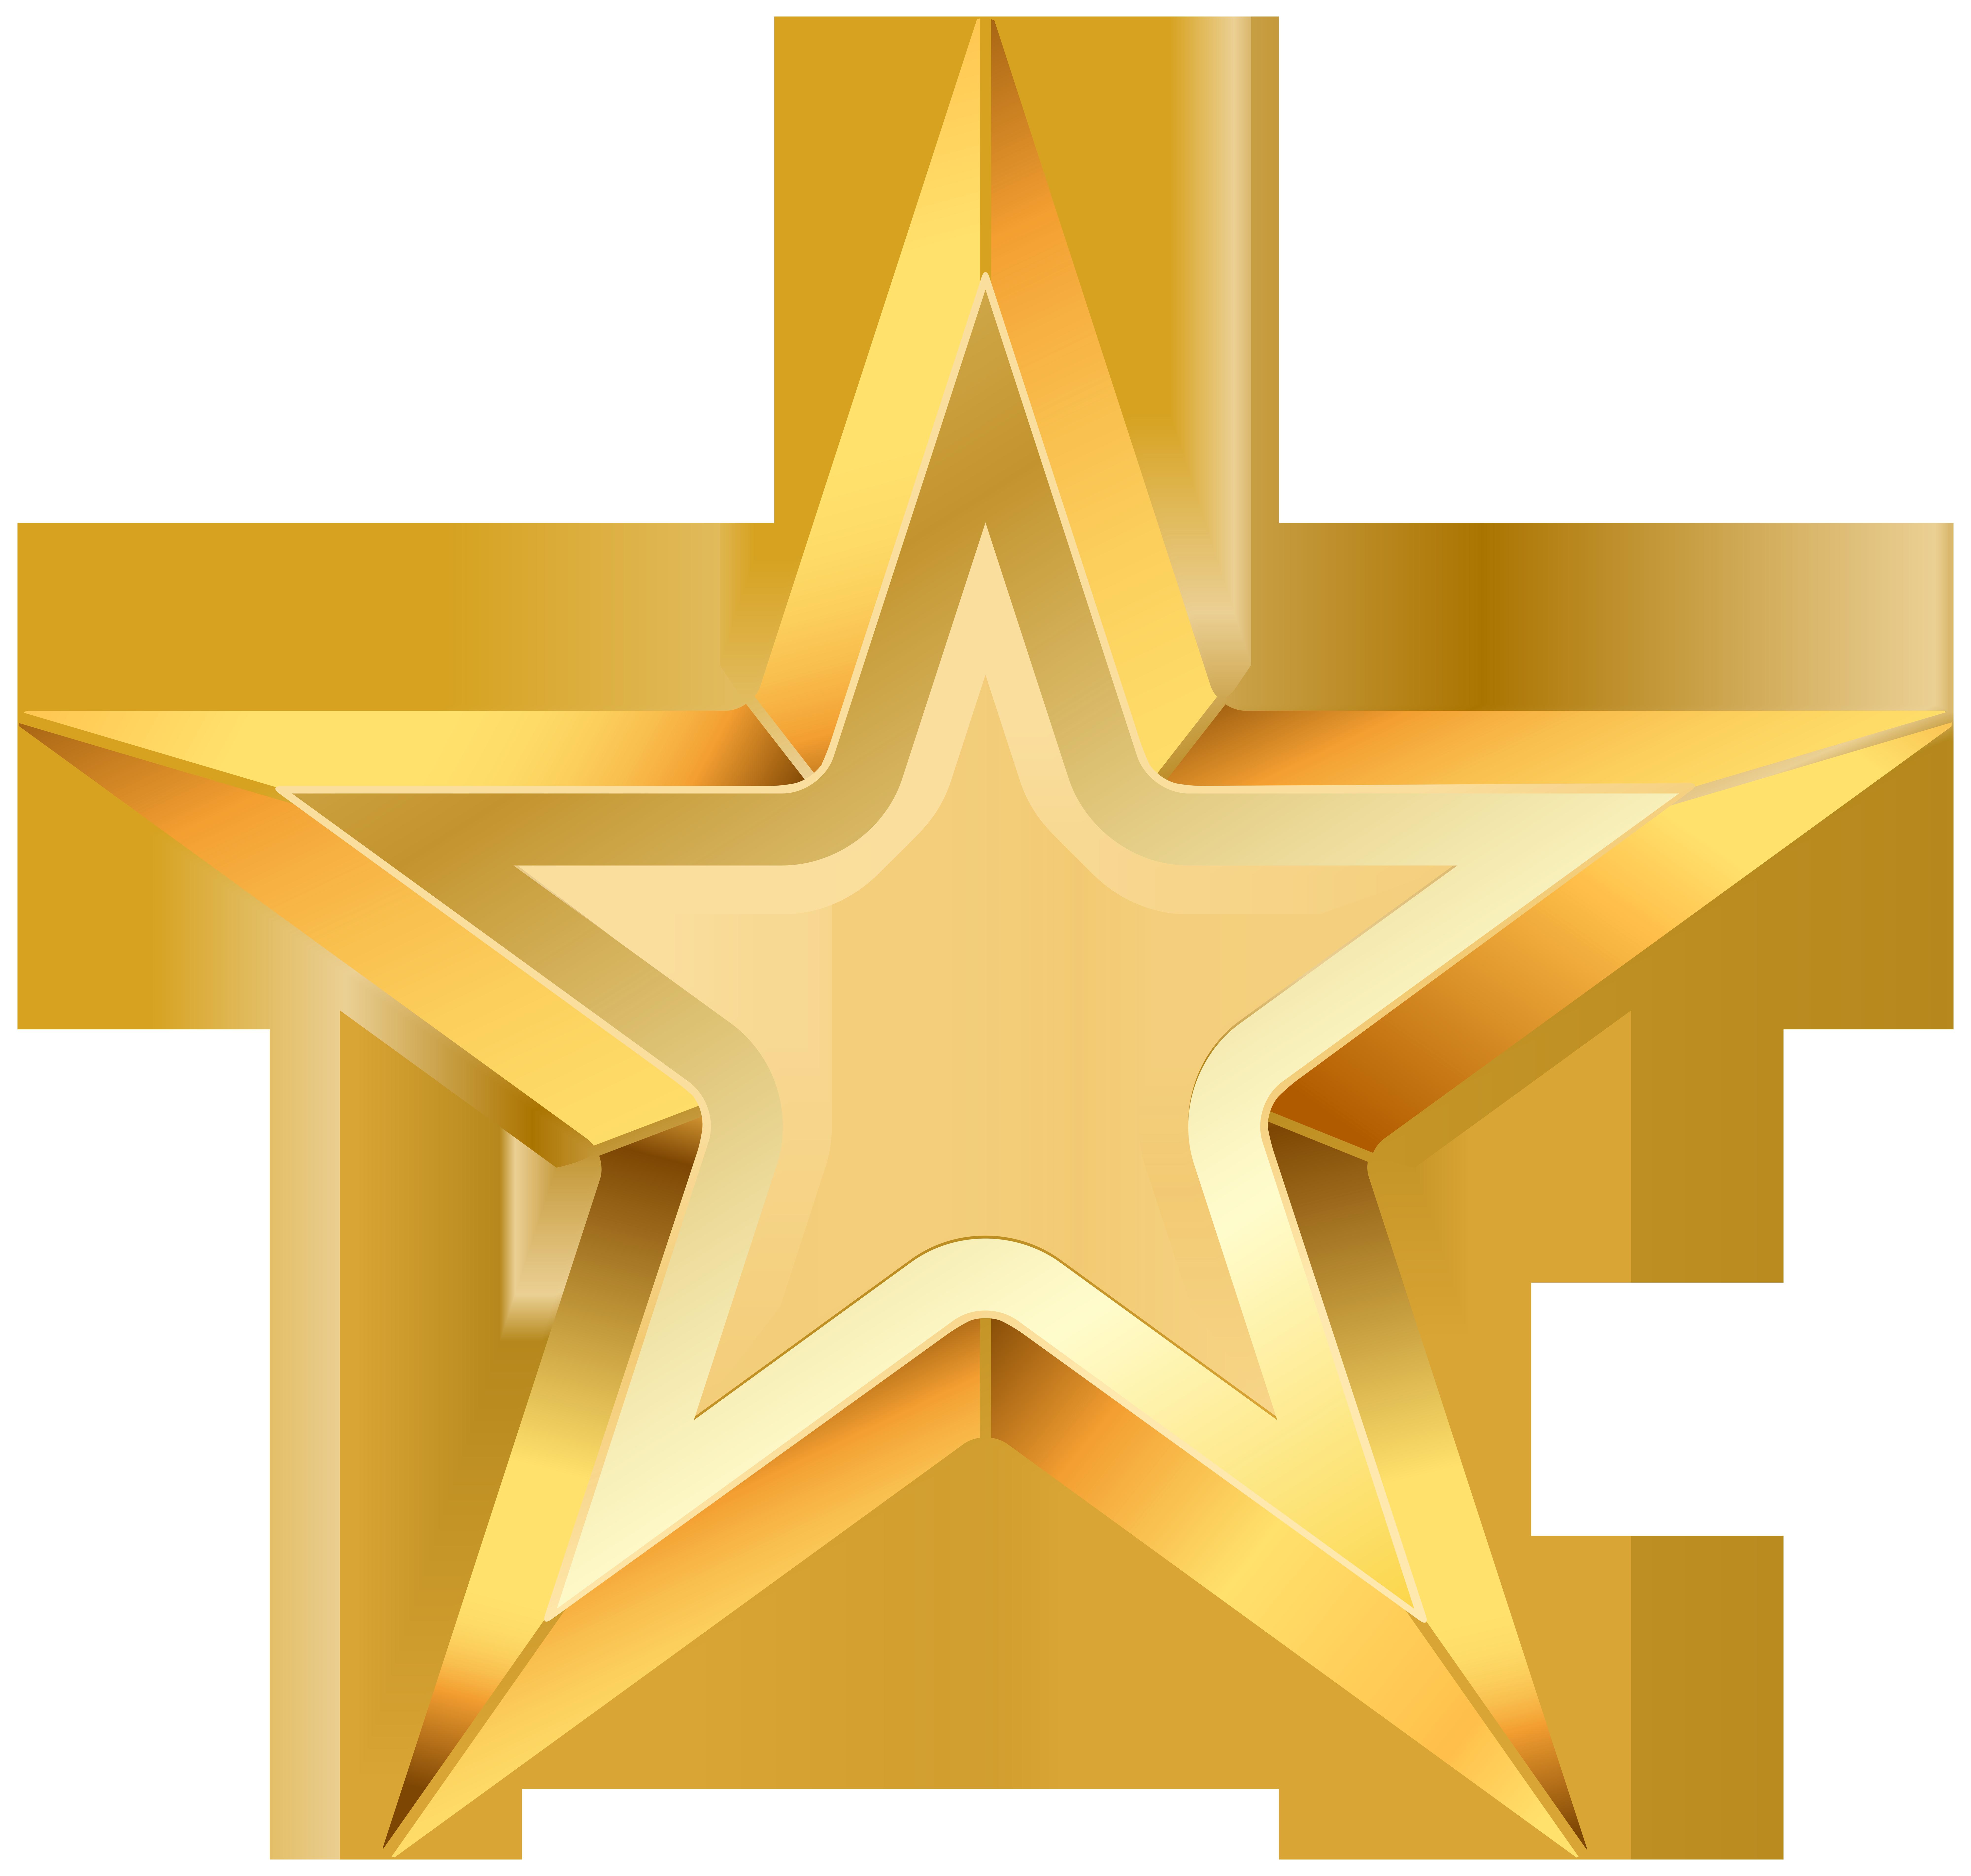 Star Clip art - Gold Star PNG Transparent Clip Art Image 8000*7616 ... clip download